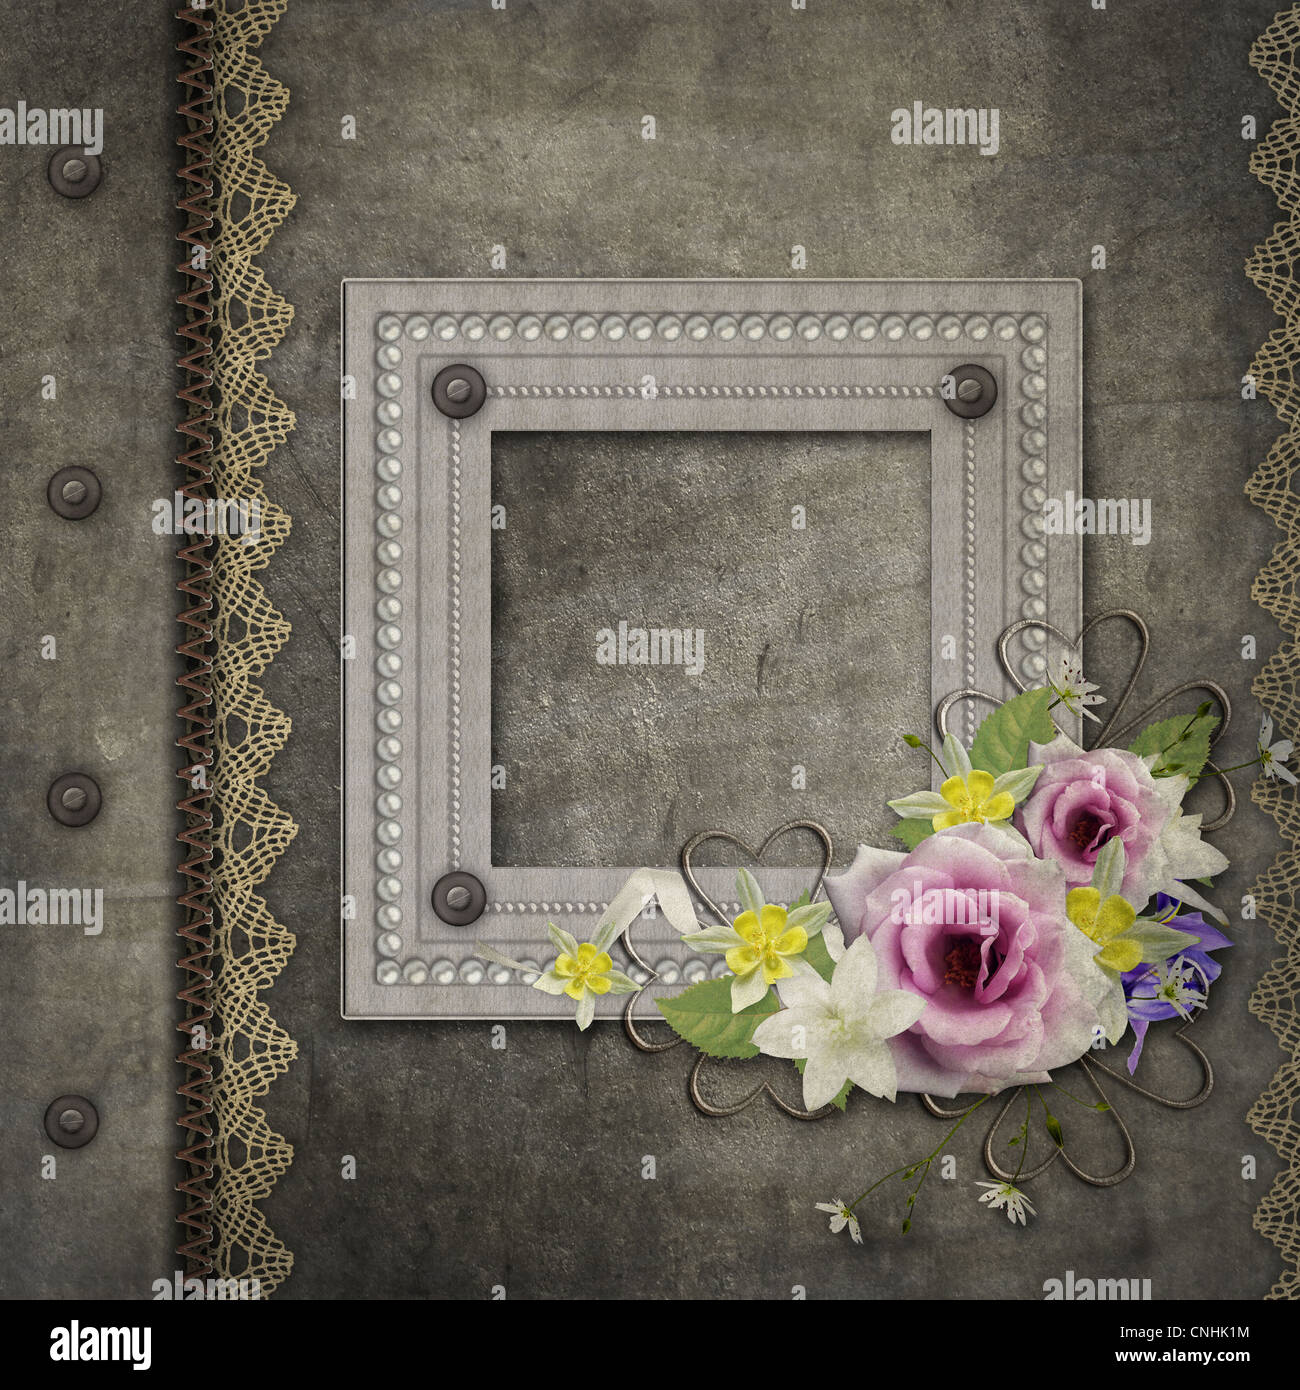 Alte Vintage Album-Cover mit Rahmen, rose, Perle, Spitze Stockfoto ...